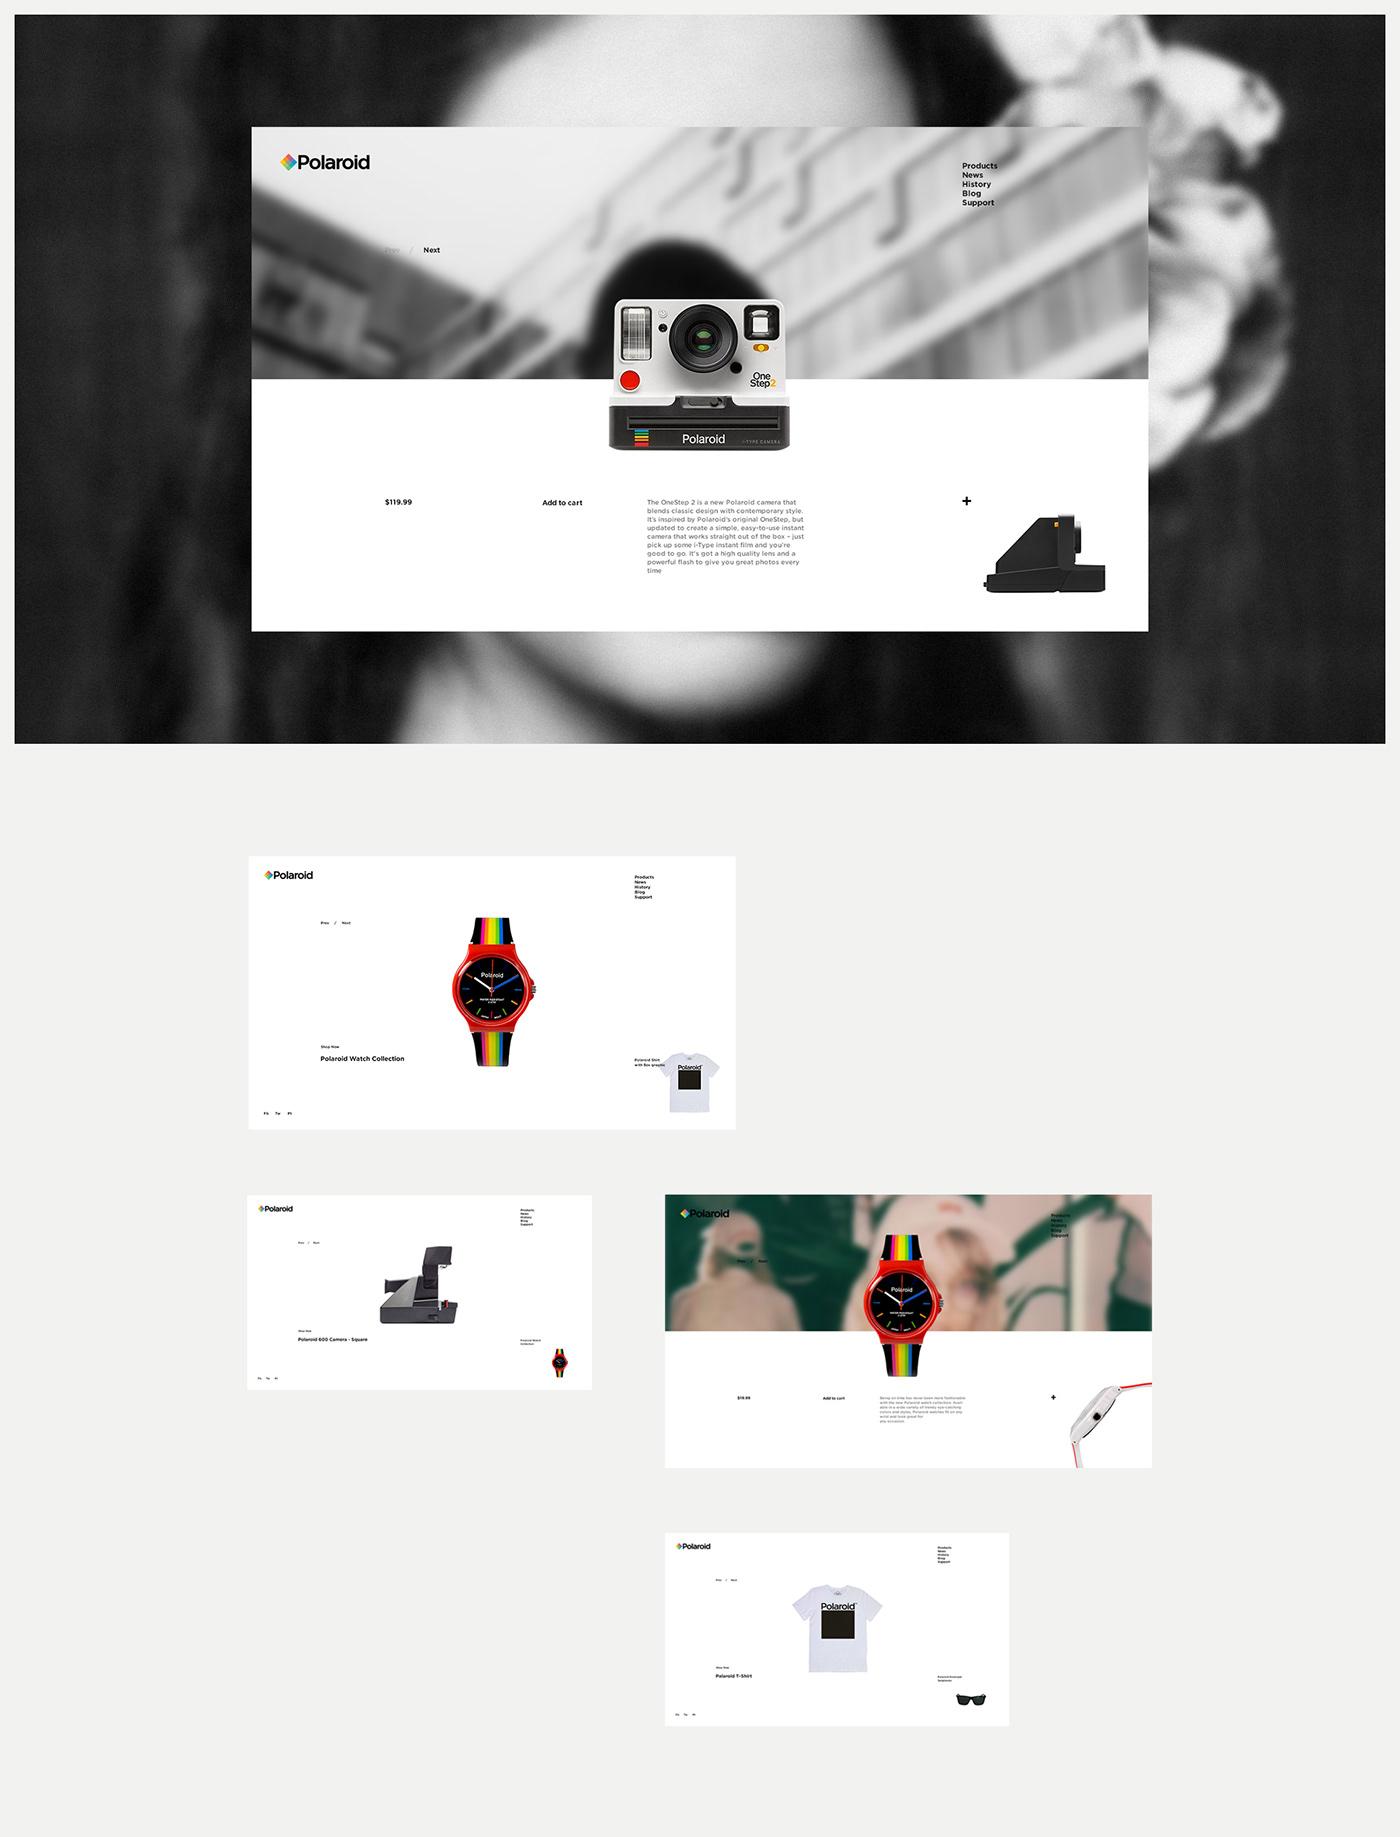 UI ux Web minimal clean POLAROID poster concept photo